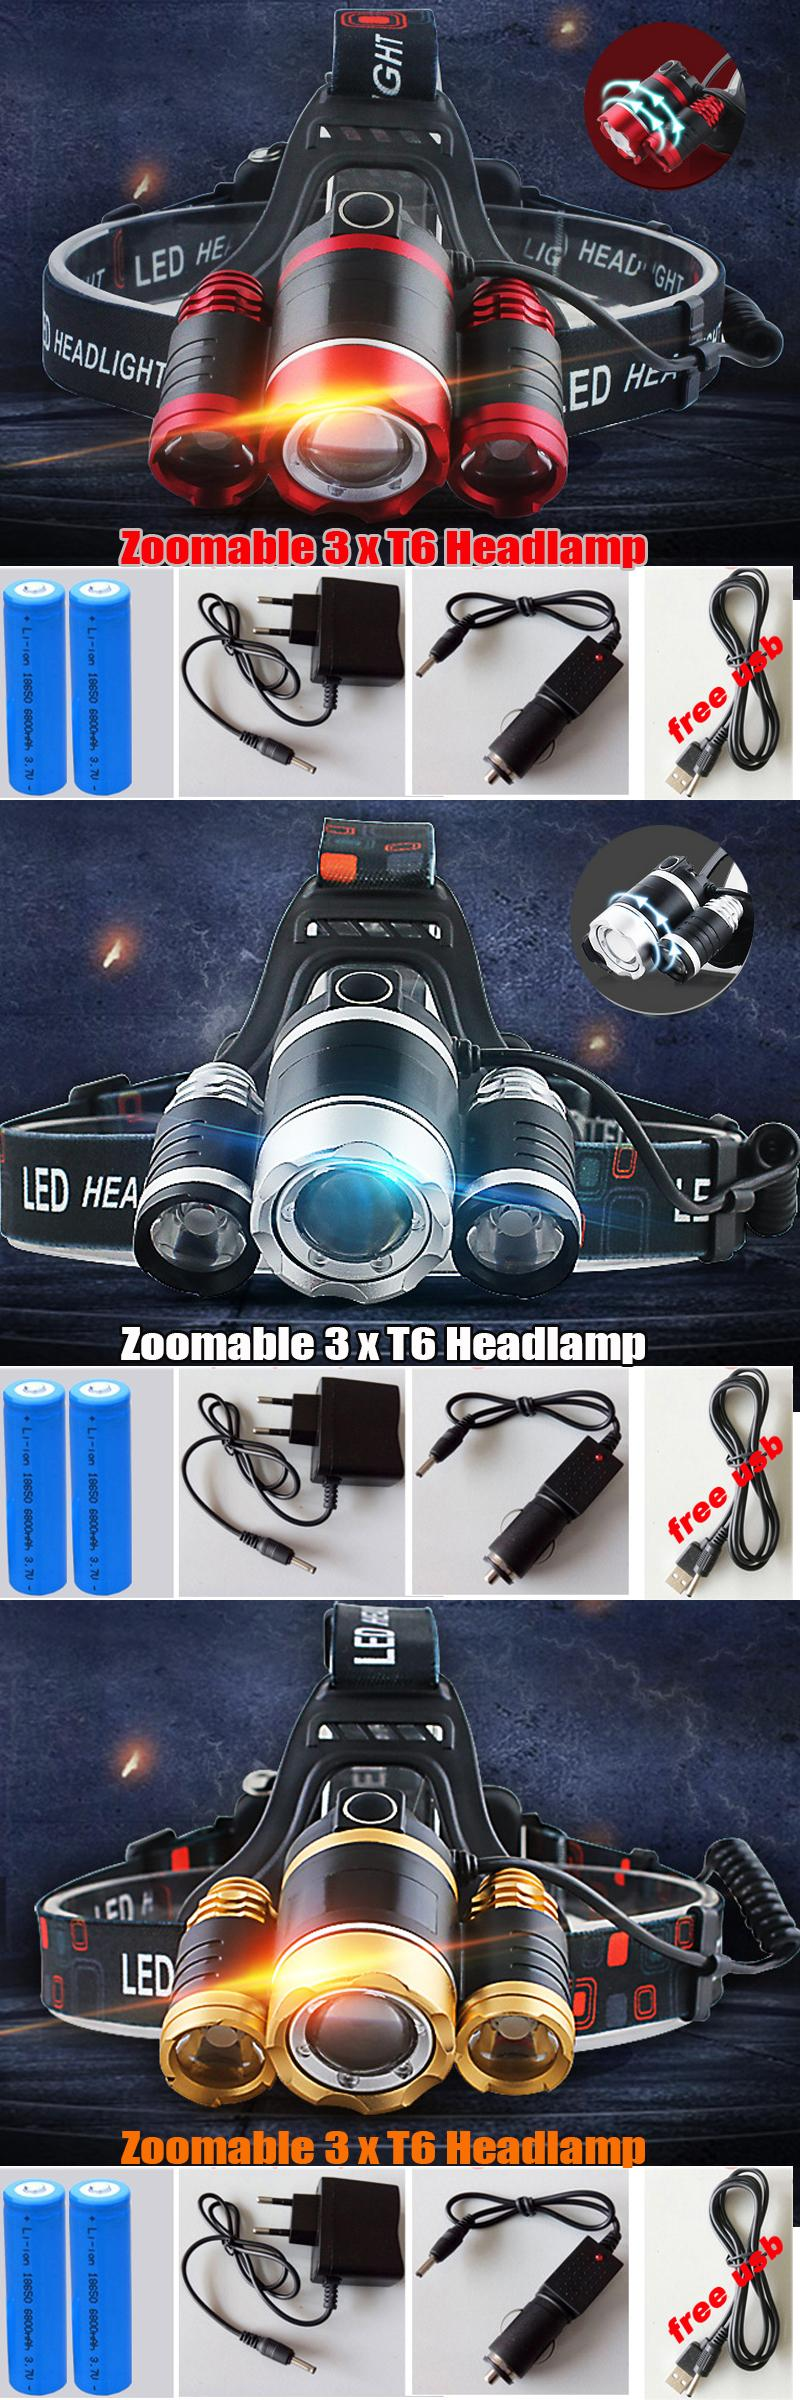 visit to 3 cree xm l t6 led headlamp headlight lumens